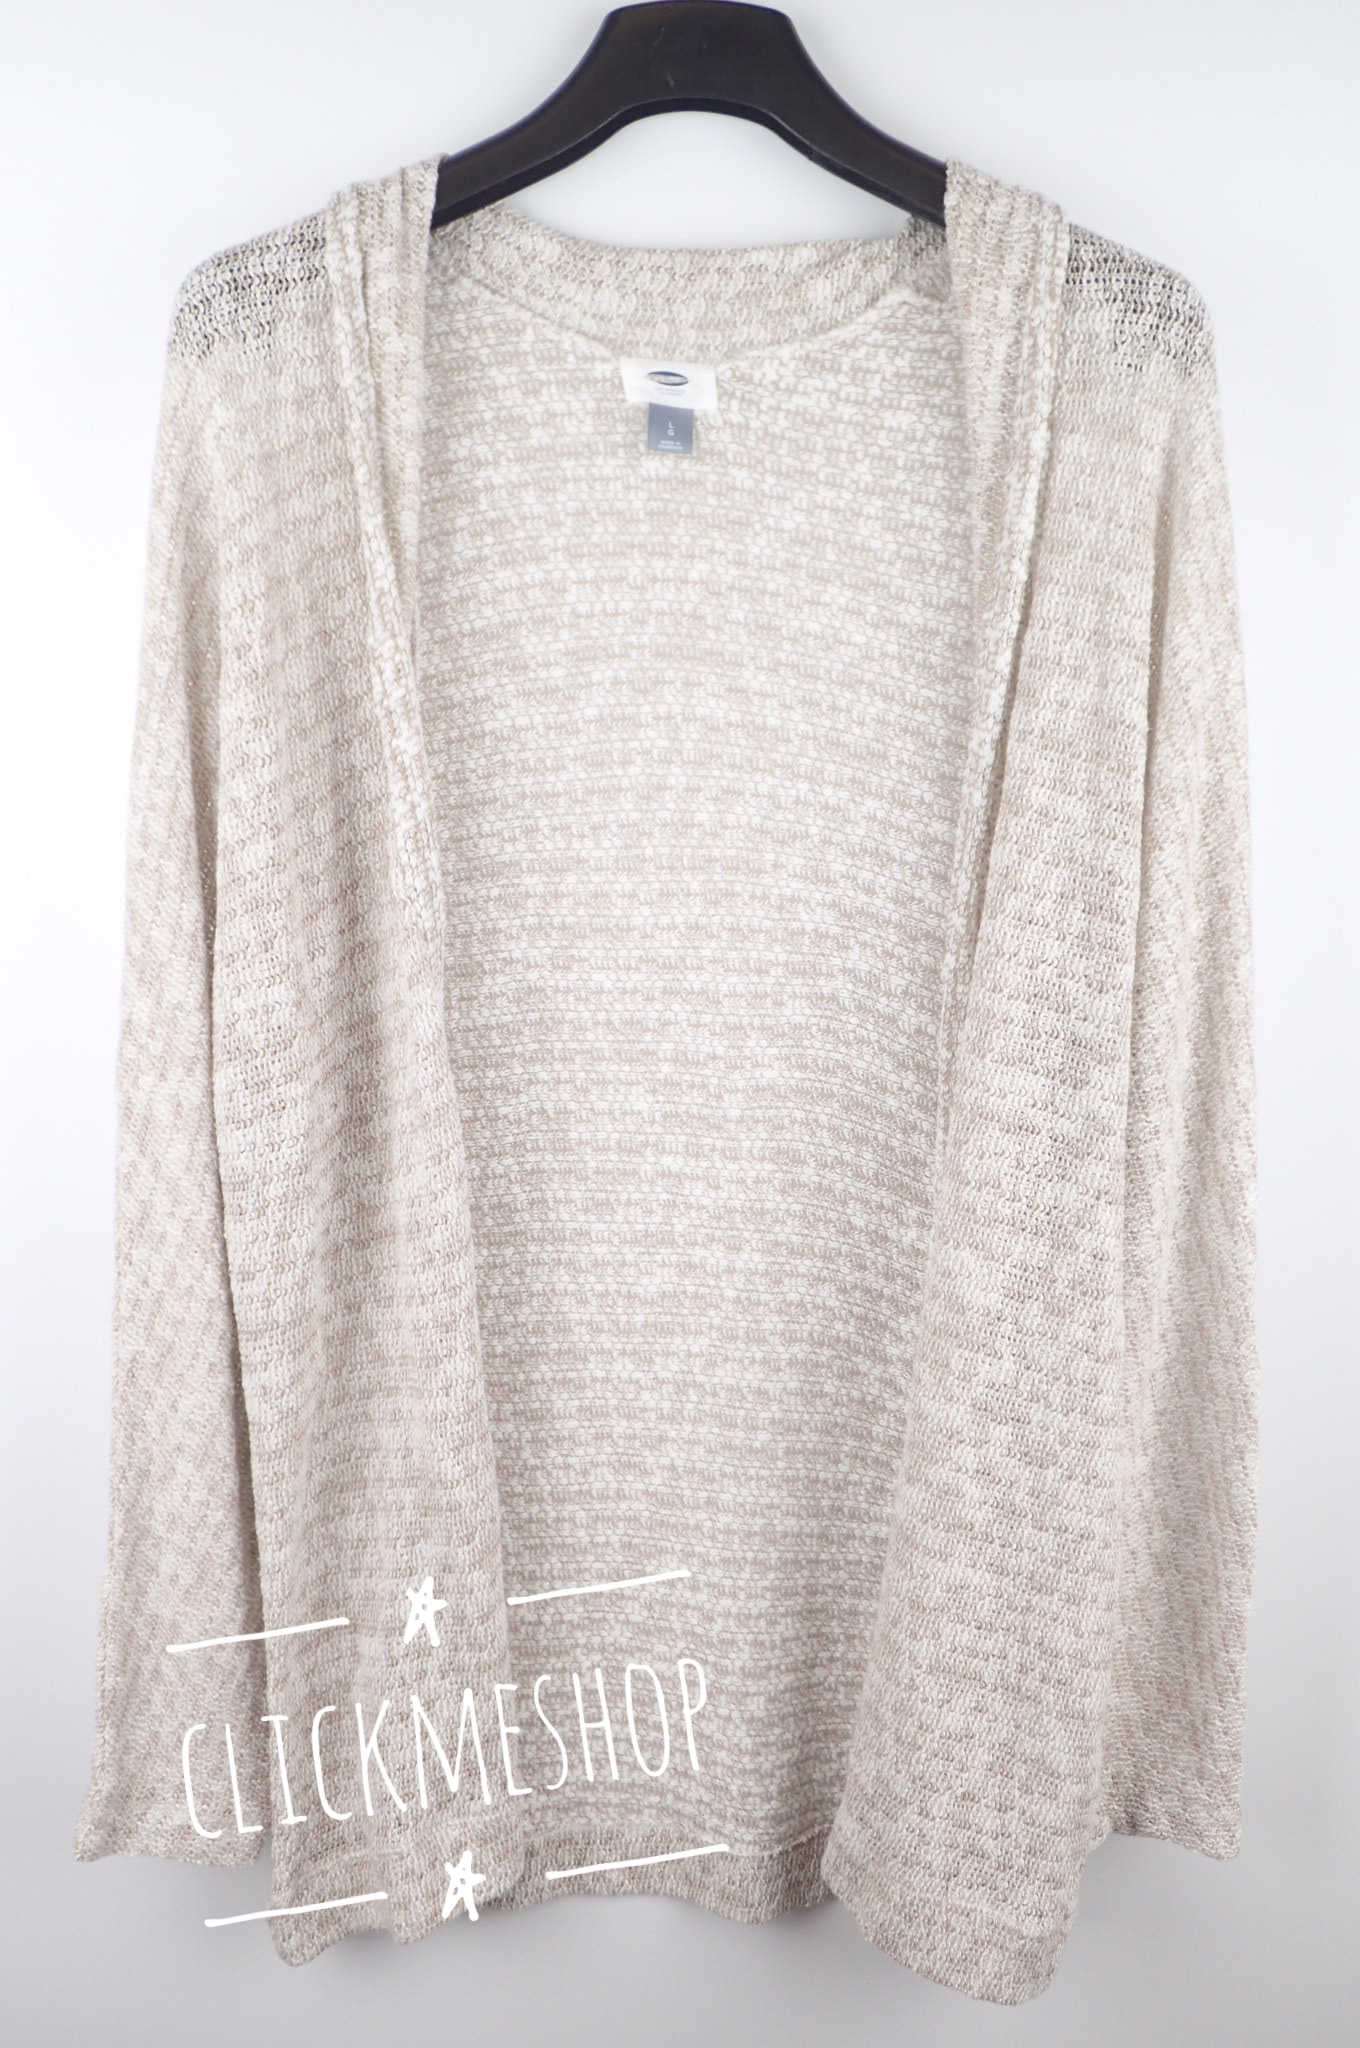 (size L หน้าอก 44-46 นิ้ว ) เสื้อคลุม Oldnavy สีน้ำตาลอ่อน ใส่คลุมสบายๆ น่ารักคะ